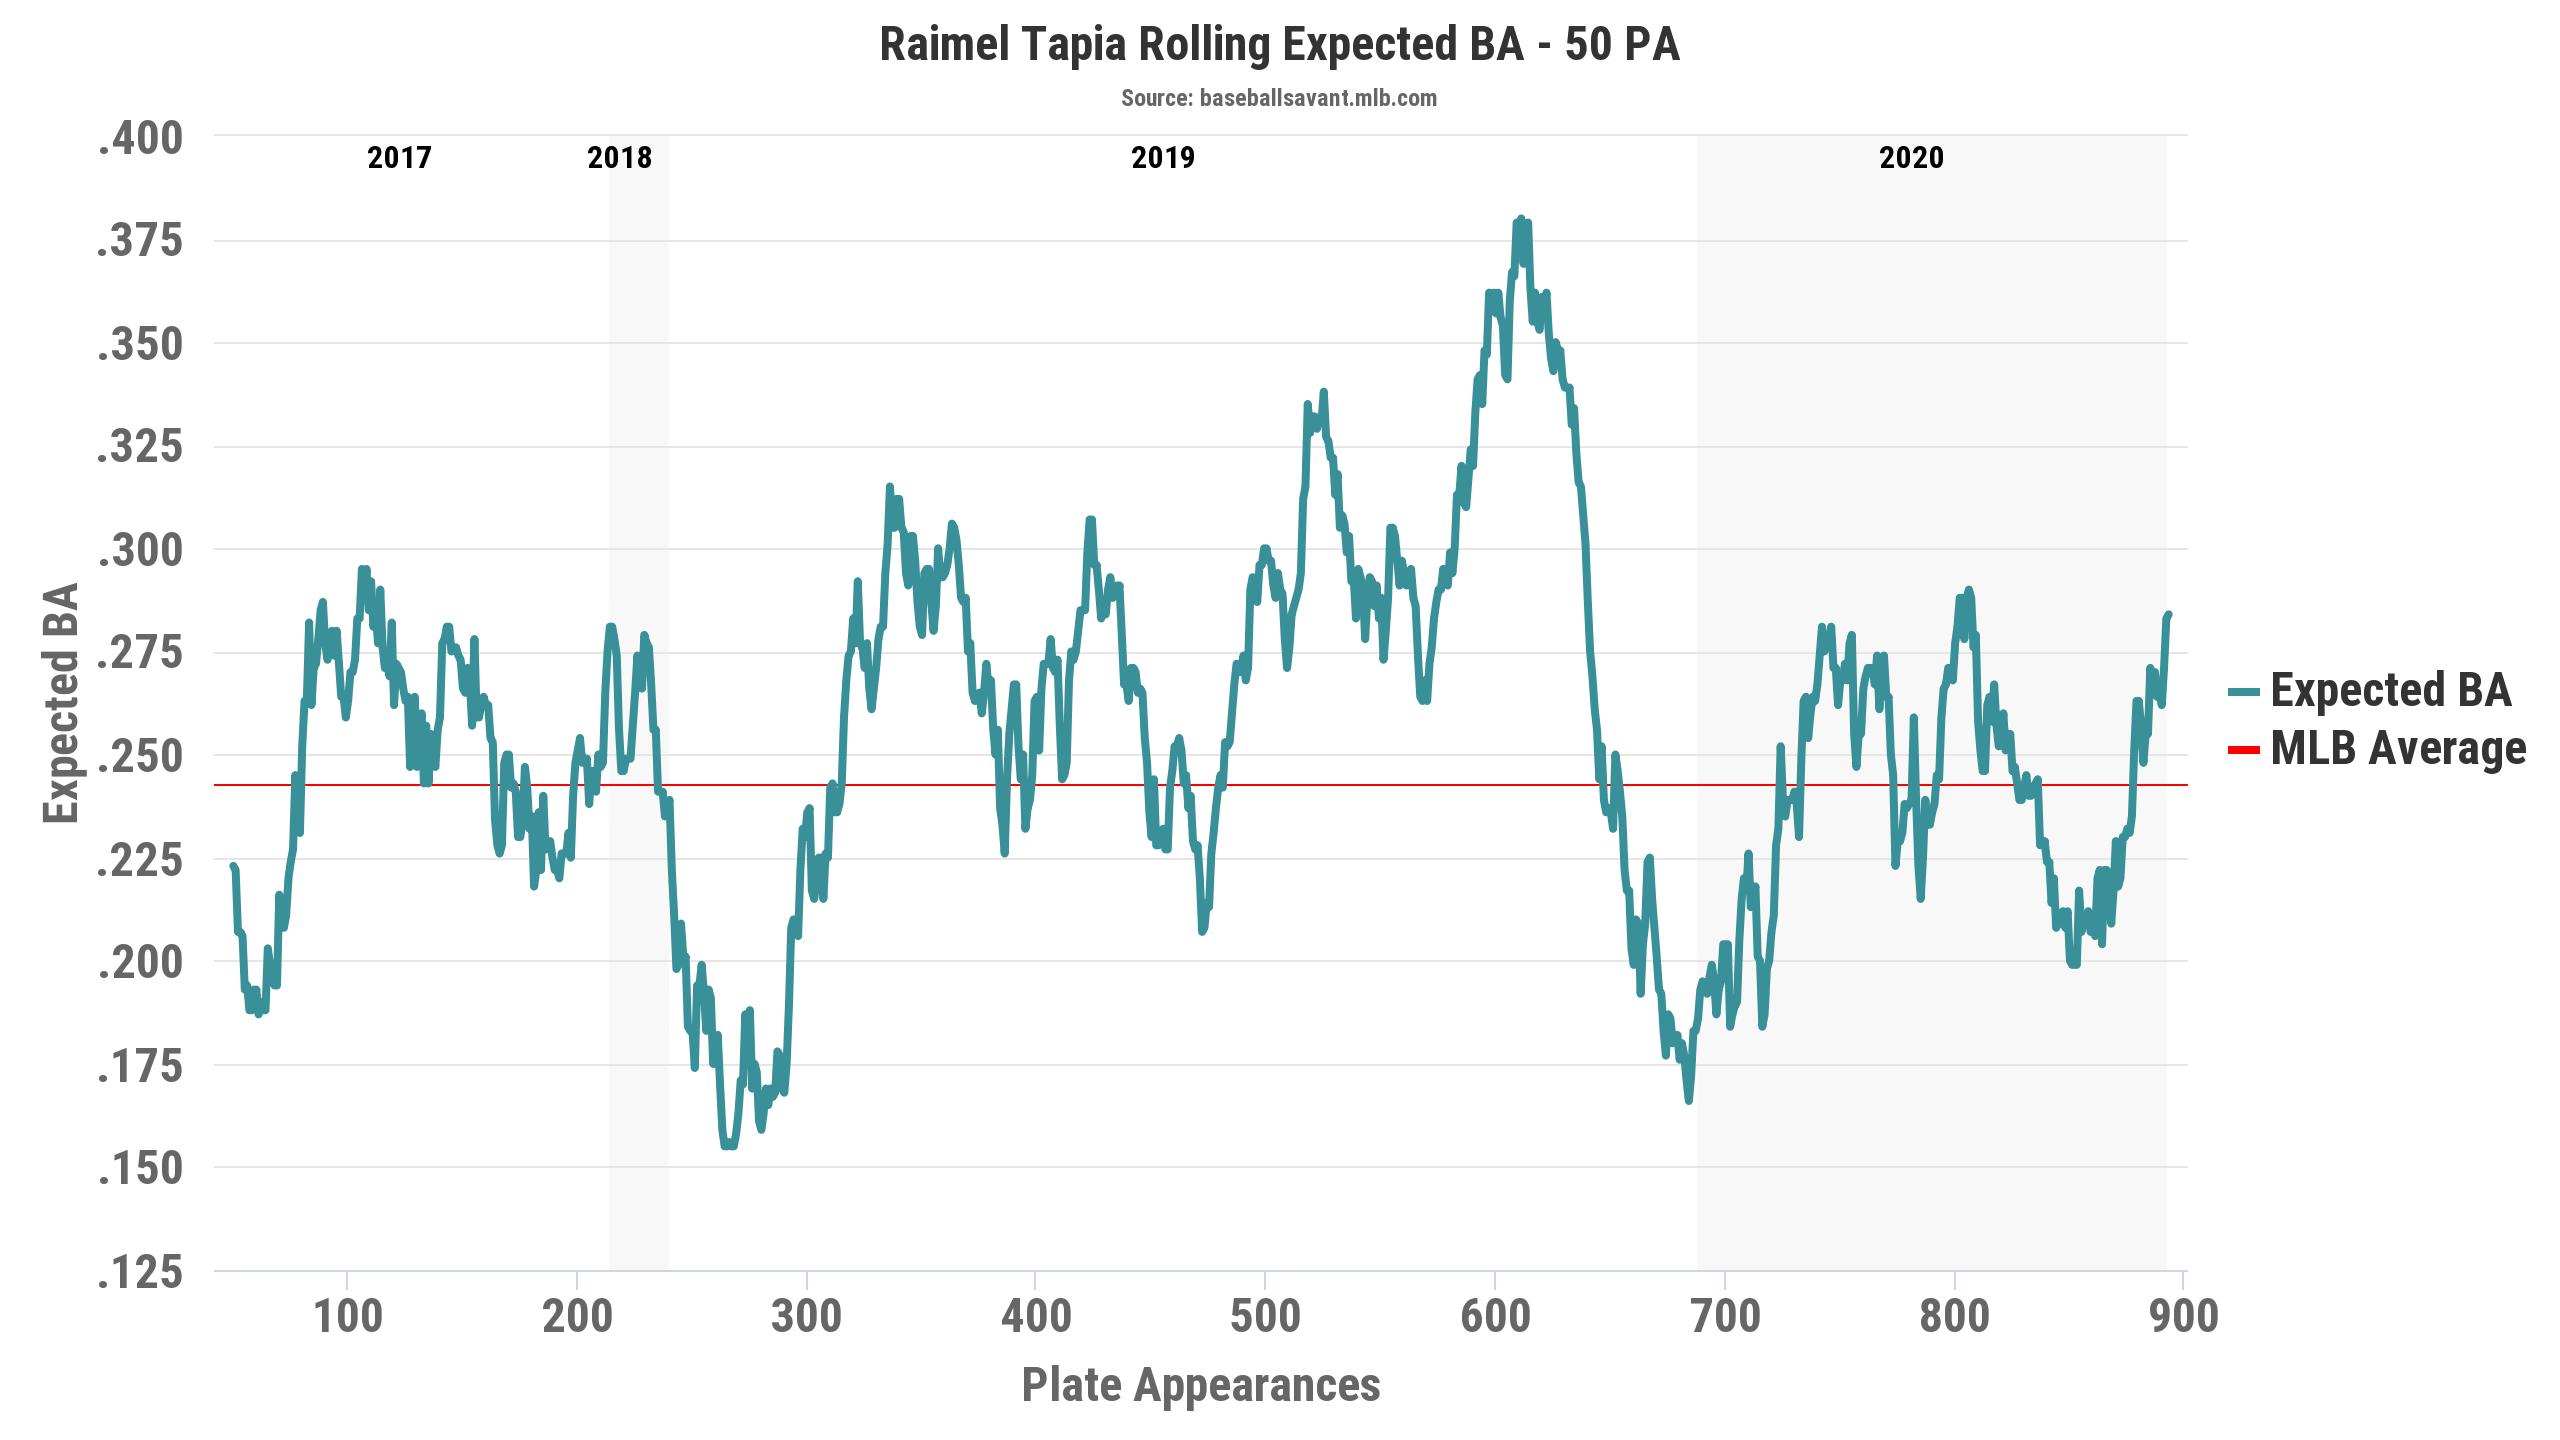 Tapia expected batting average